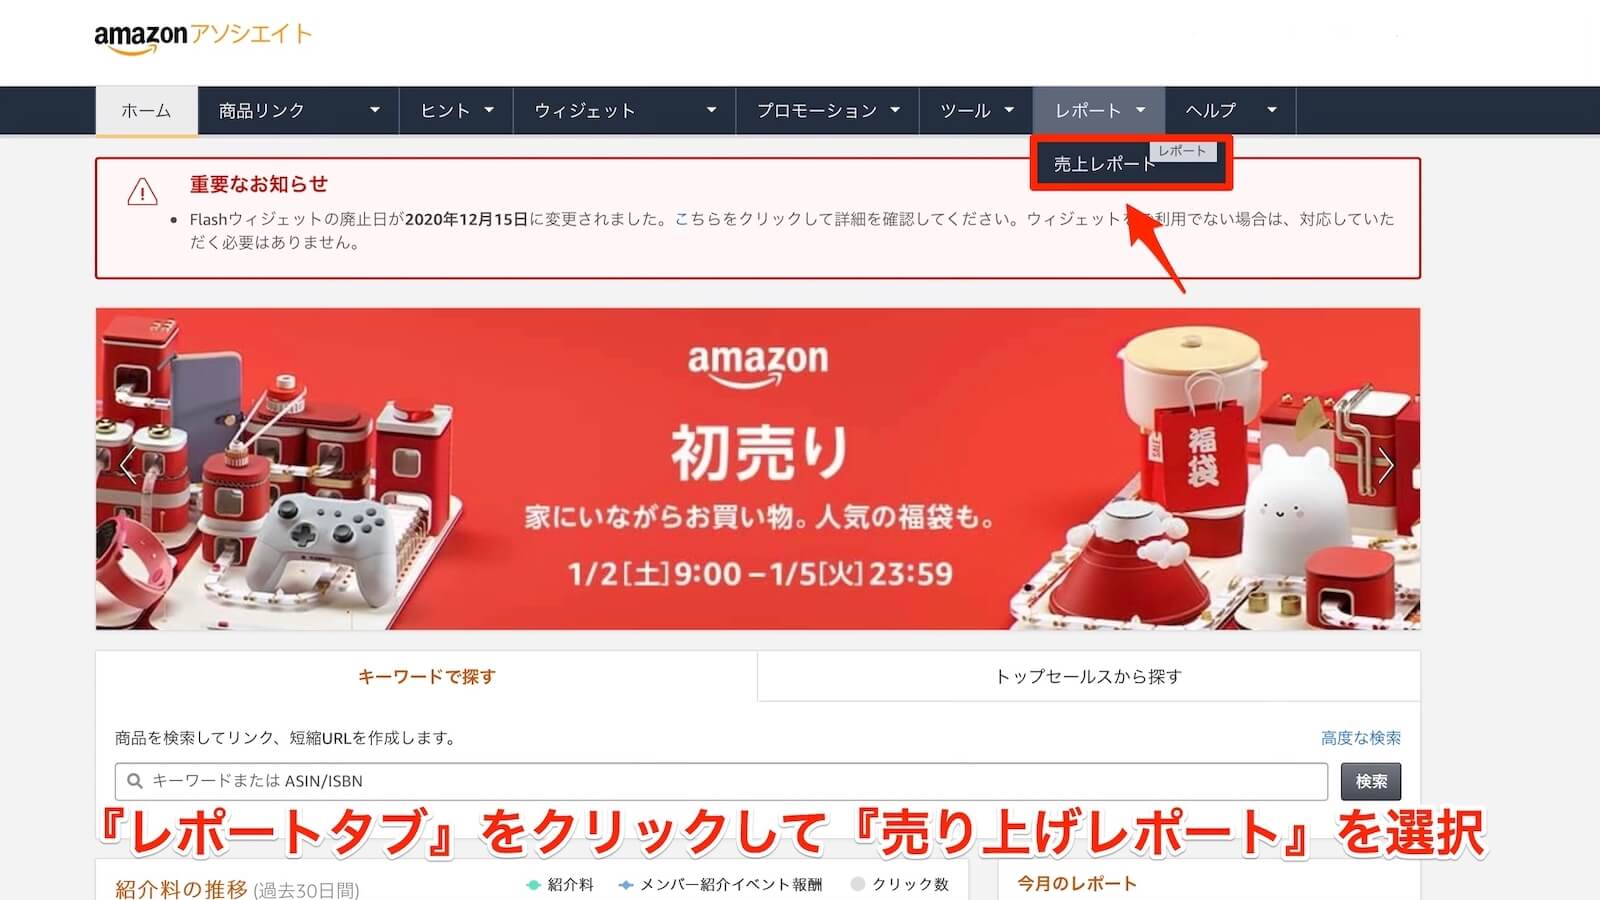 Amazon Associate Management Screen Capture